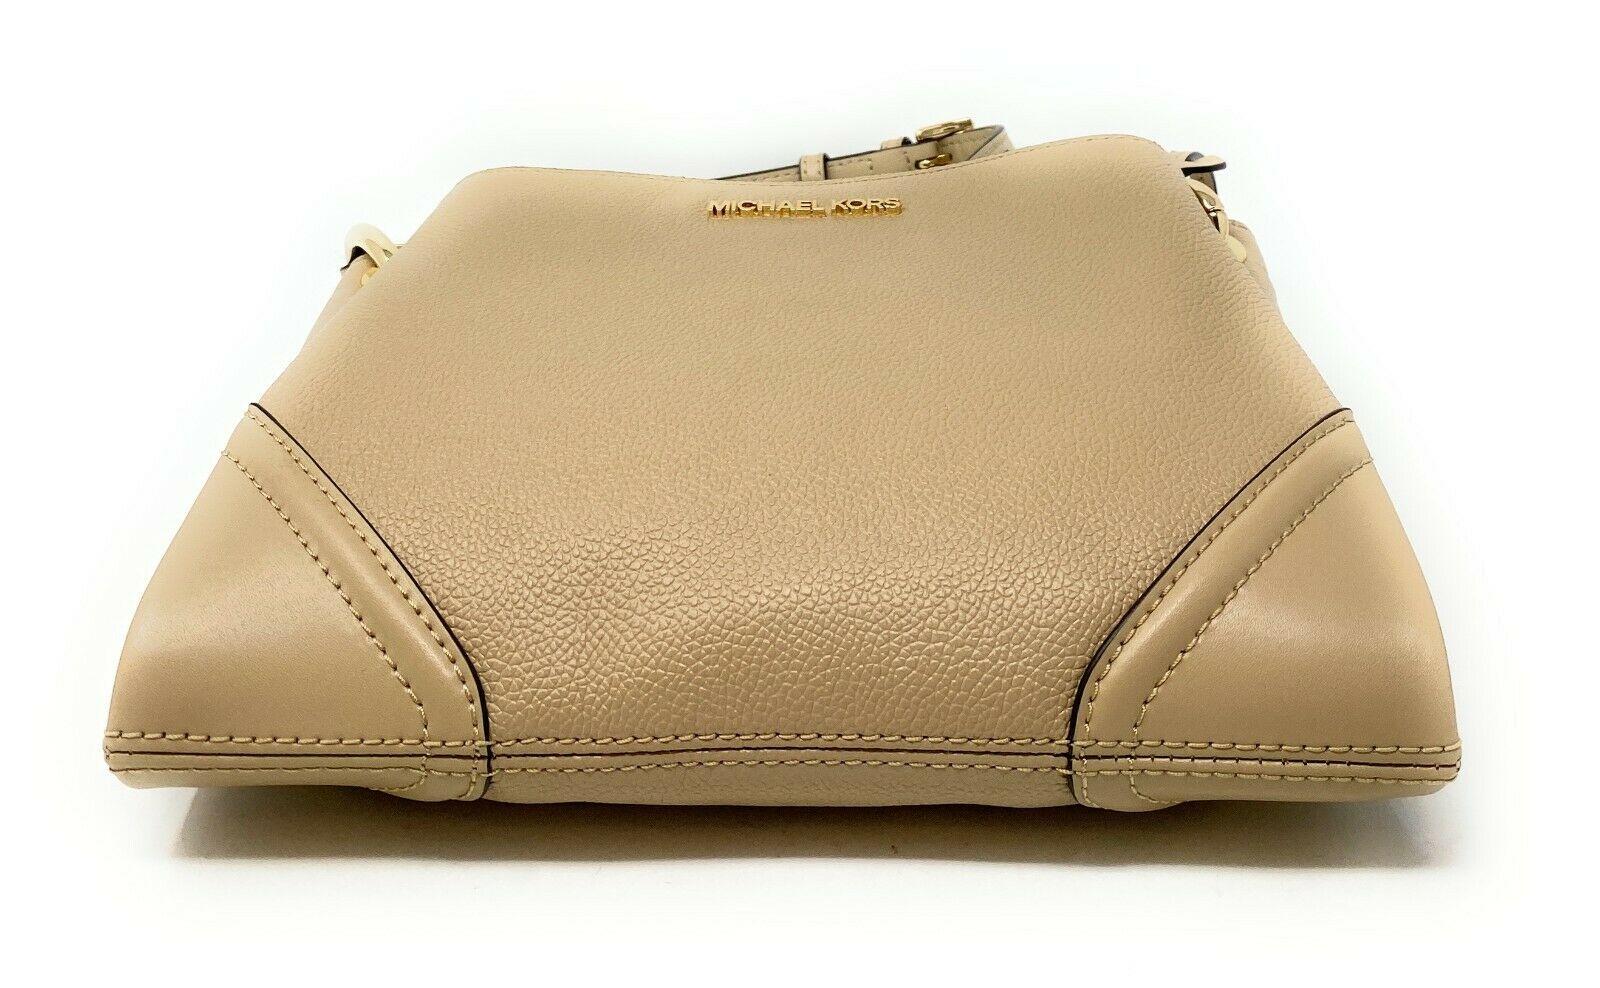 thumbnail 6 - Michael Kors Nicole Large Triple Compartment Crossbody Bag MK Purse